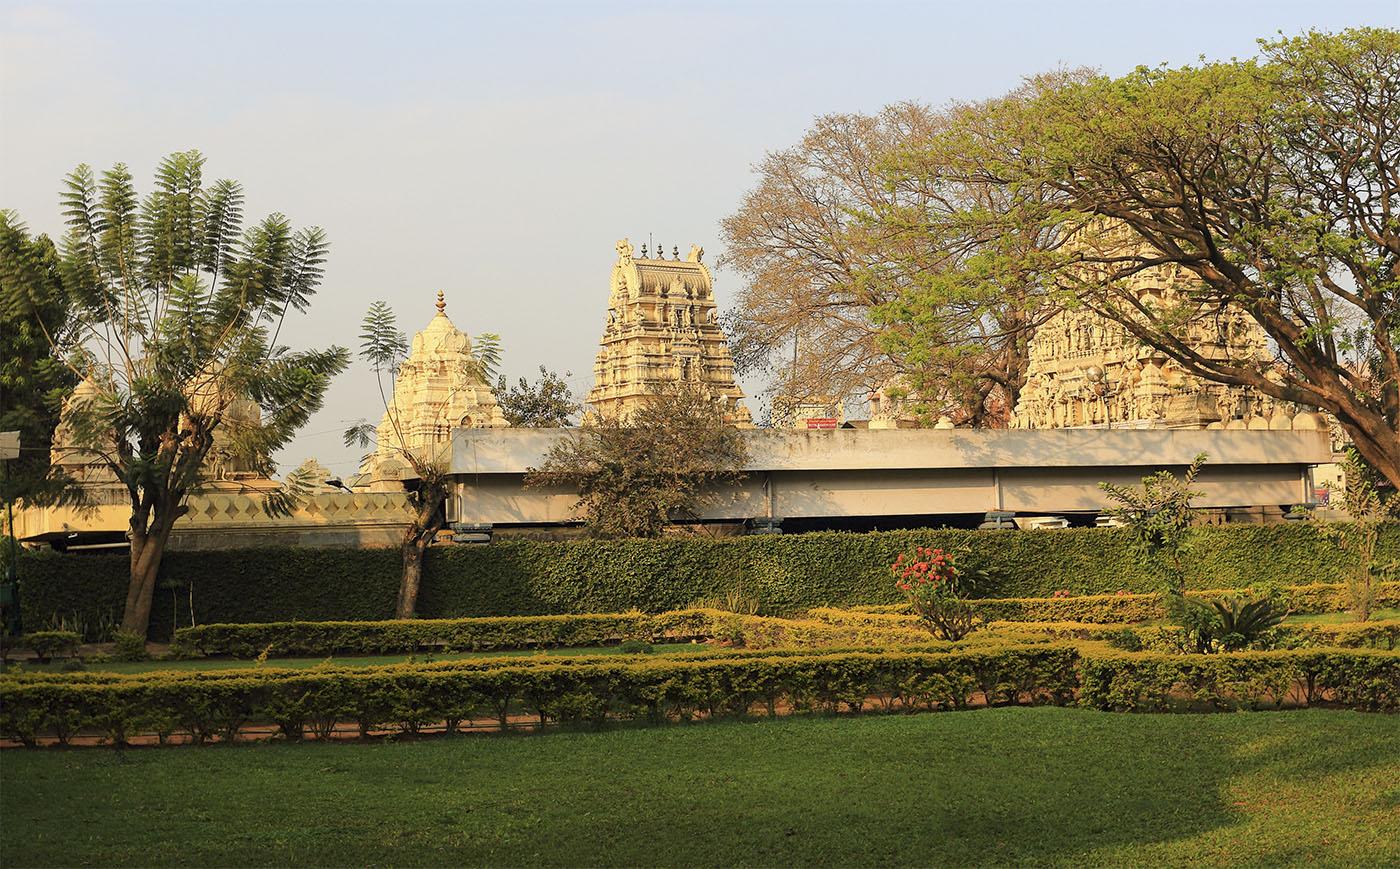 Фото 15. Храм у дворца Шрирангапатнаме (Srirangapatnam) в Бангалоре